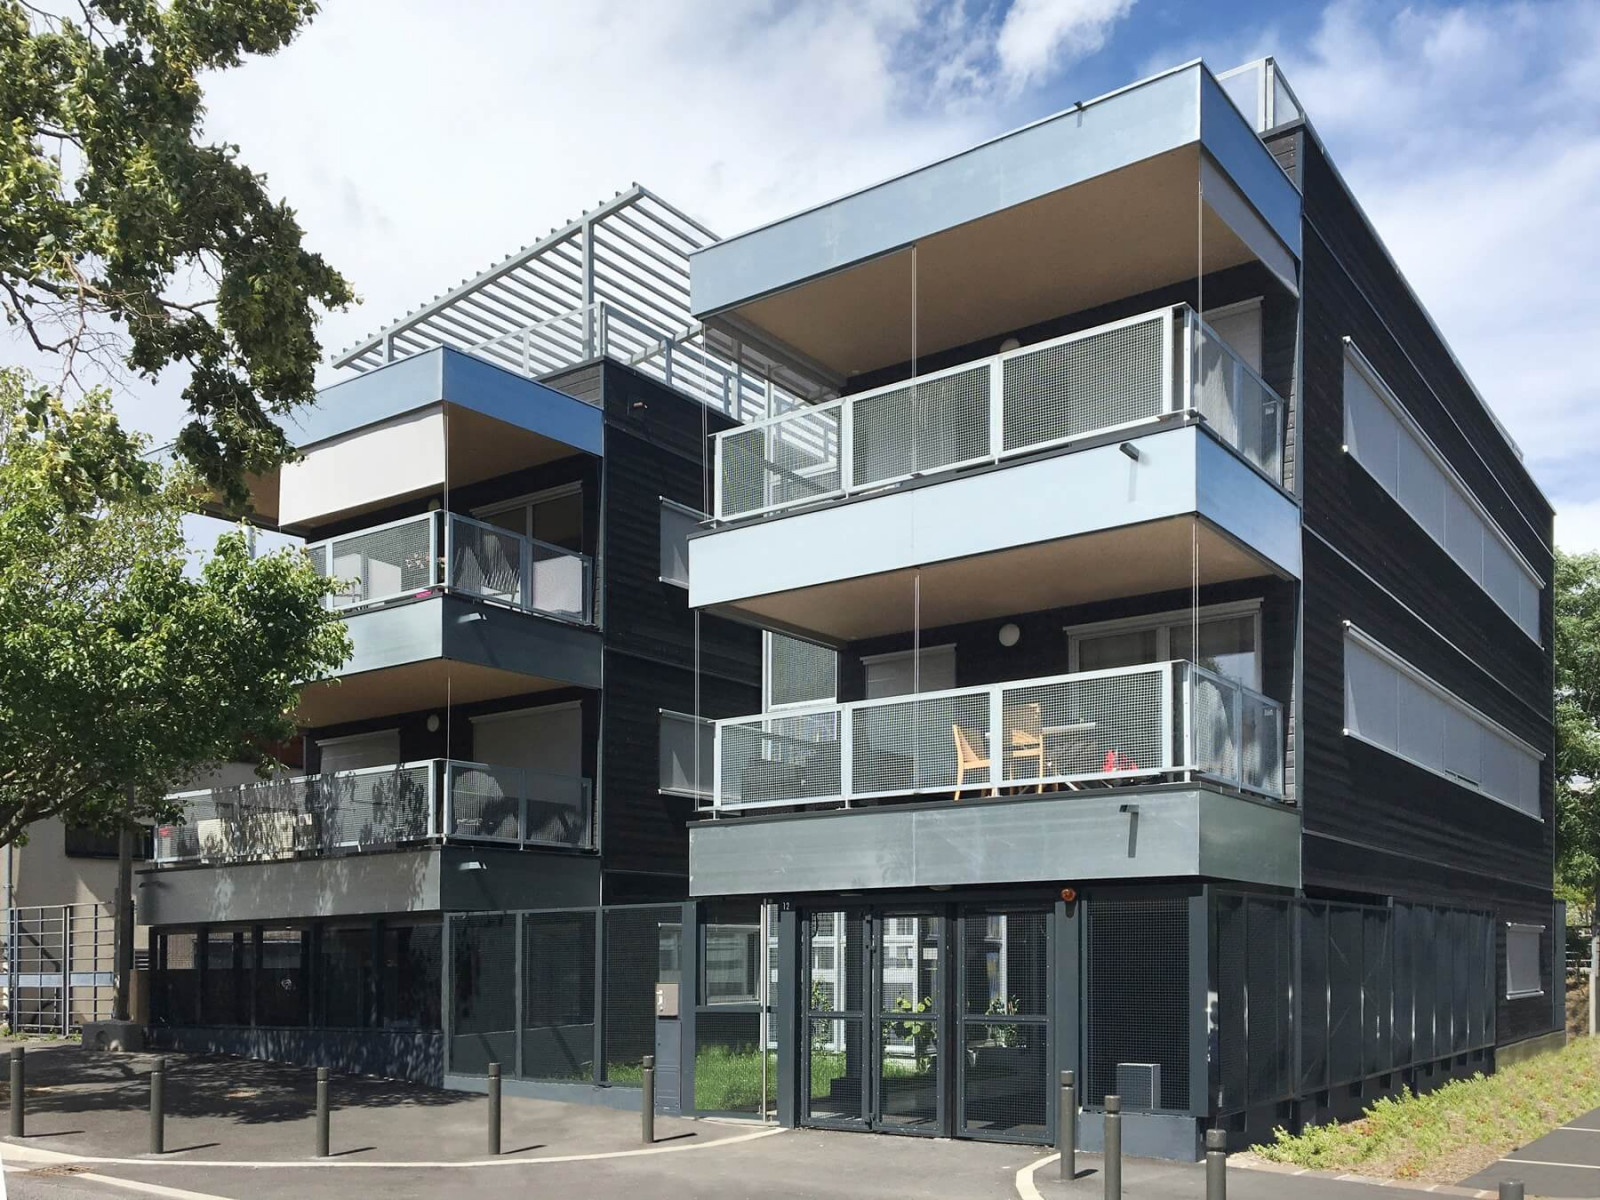 graam-vilmorin-01-logements-massy-exterieur-rue-balcons